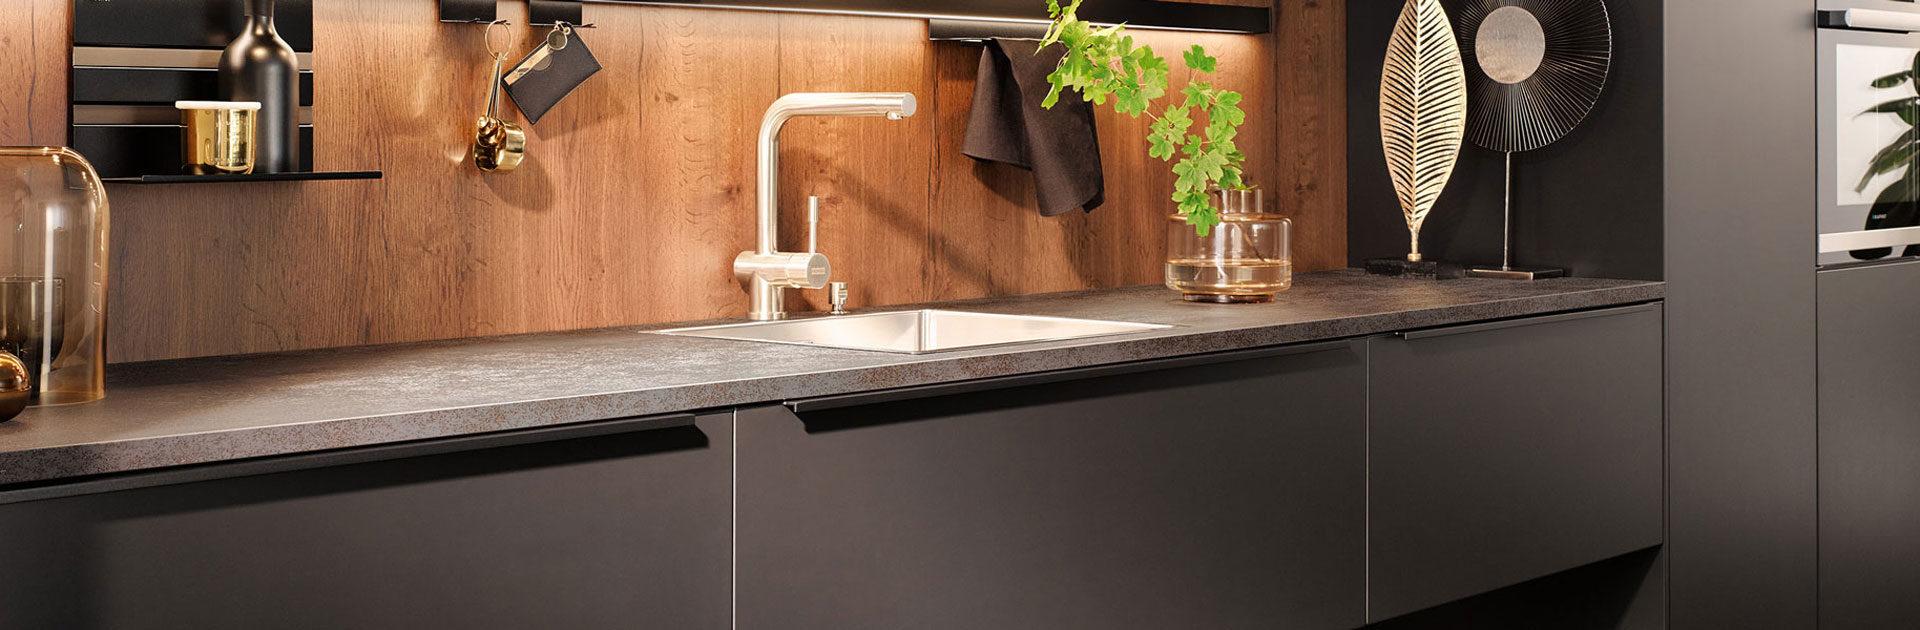 Richtlijnen Satink Keukens | COVID-19